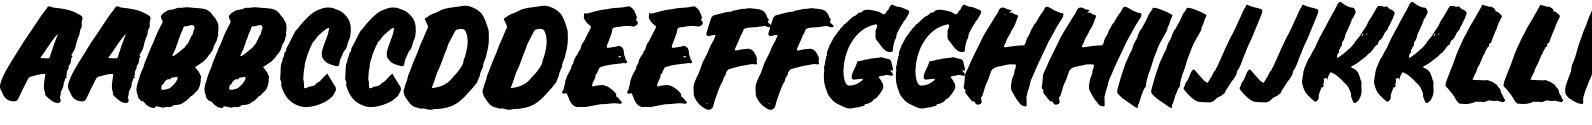 Crude OpenTypeSvg